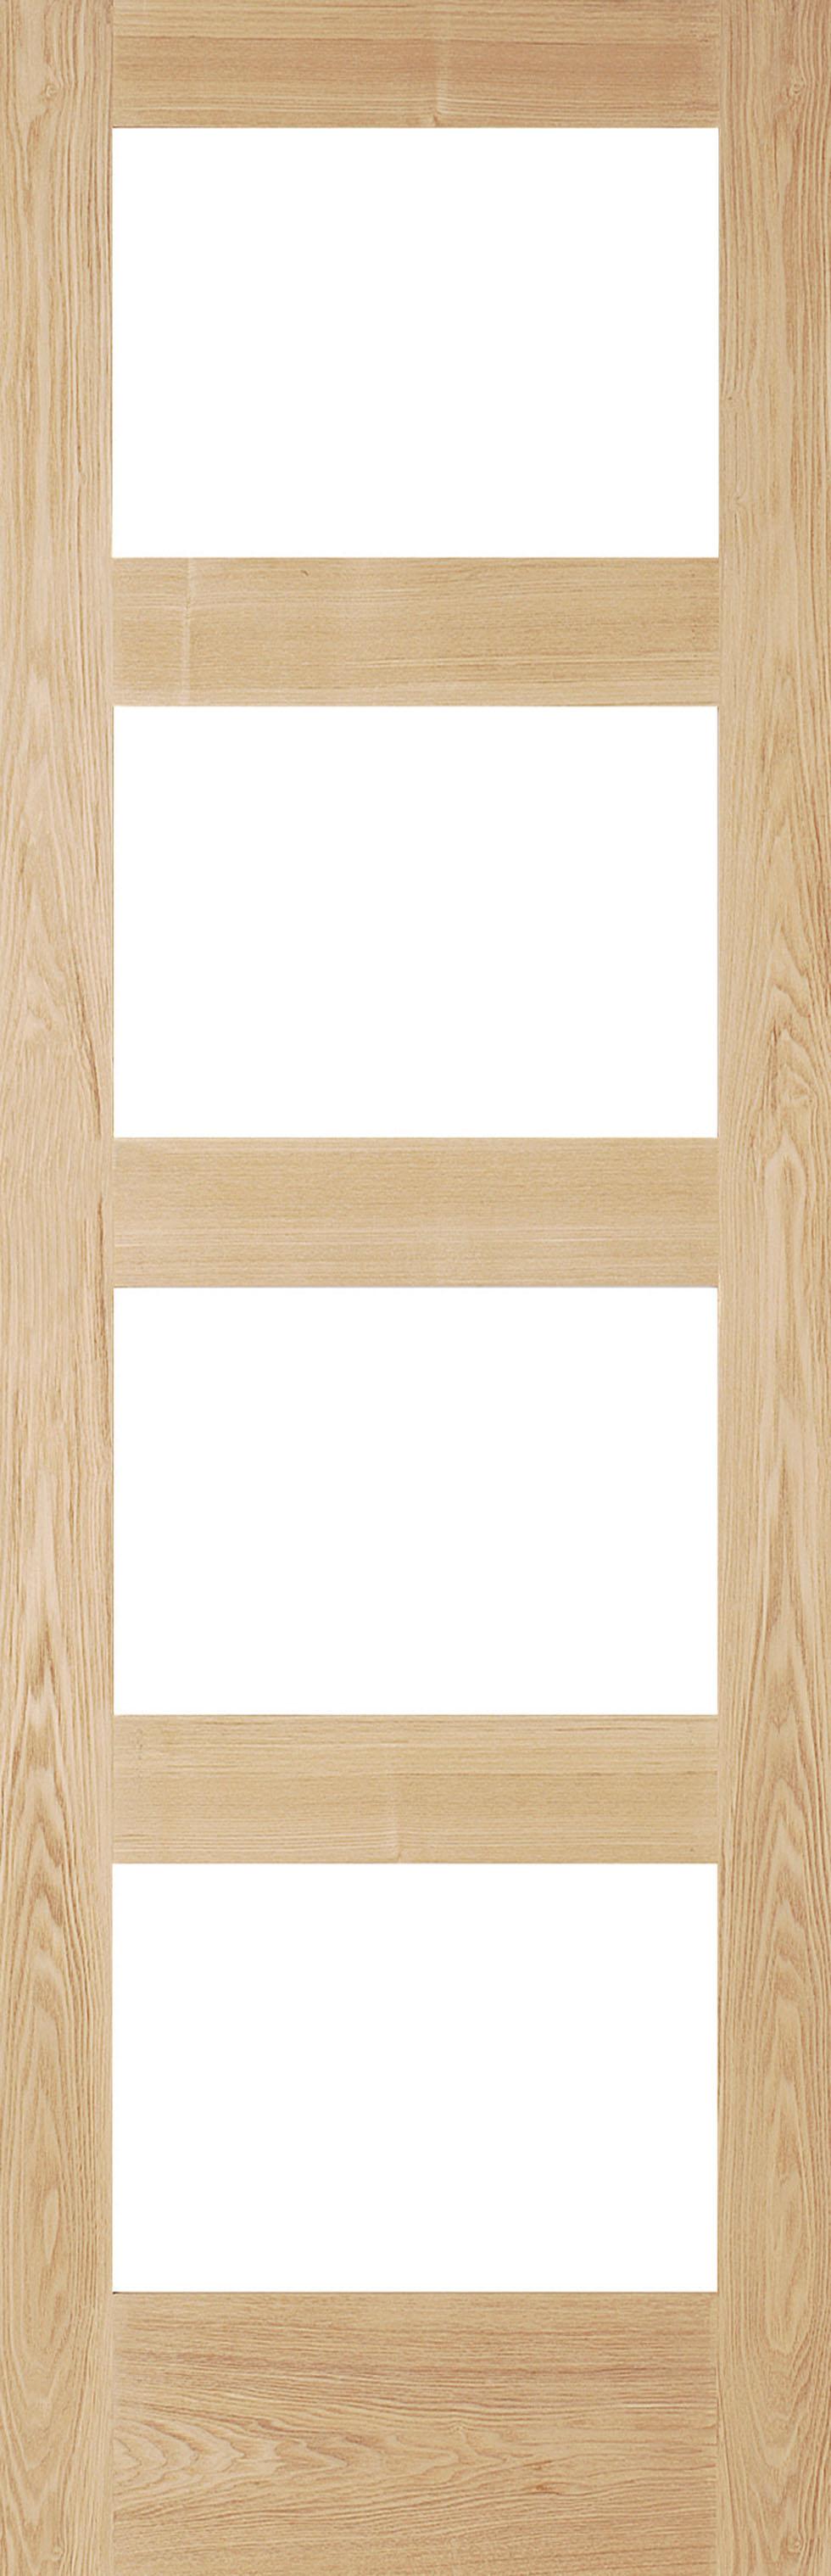 screw-fix-keld-wen  sc 1 st  Real Homes & Contemporary internal doors - Real Homes